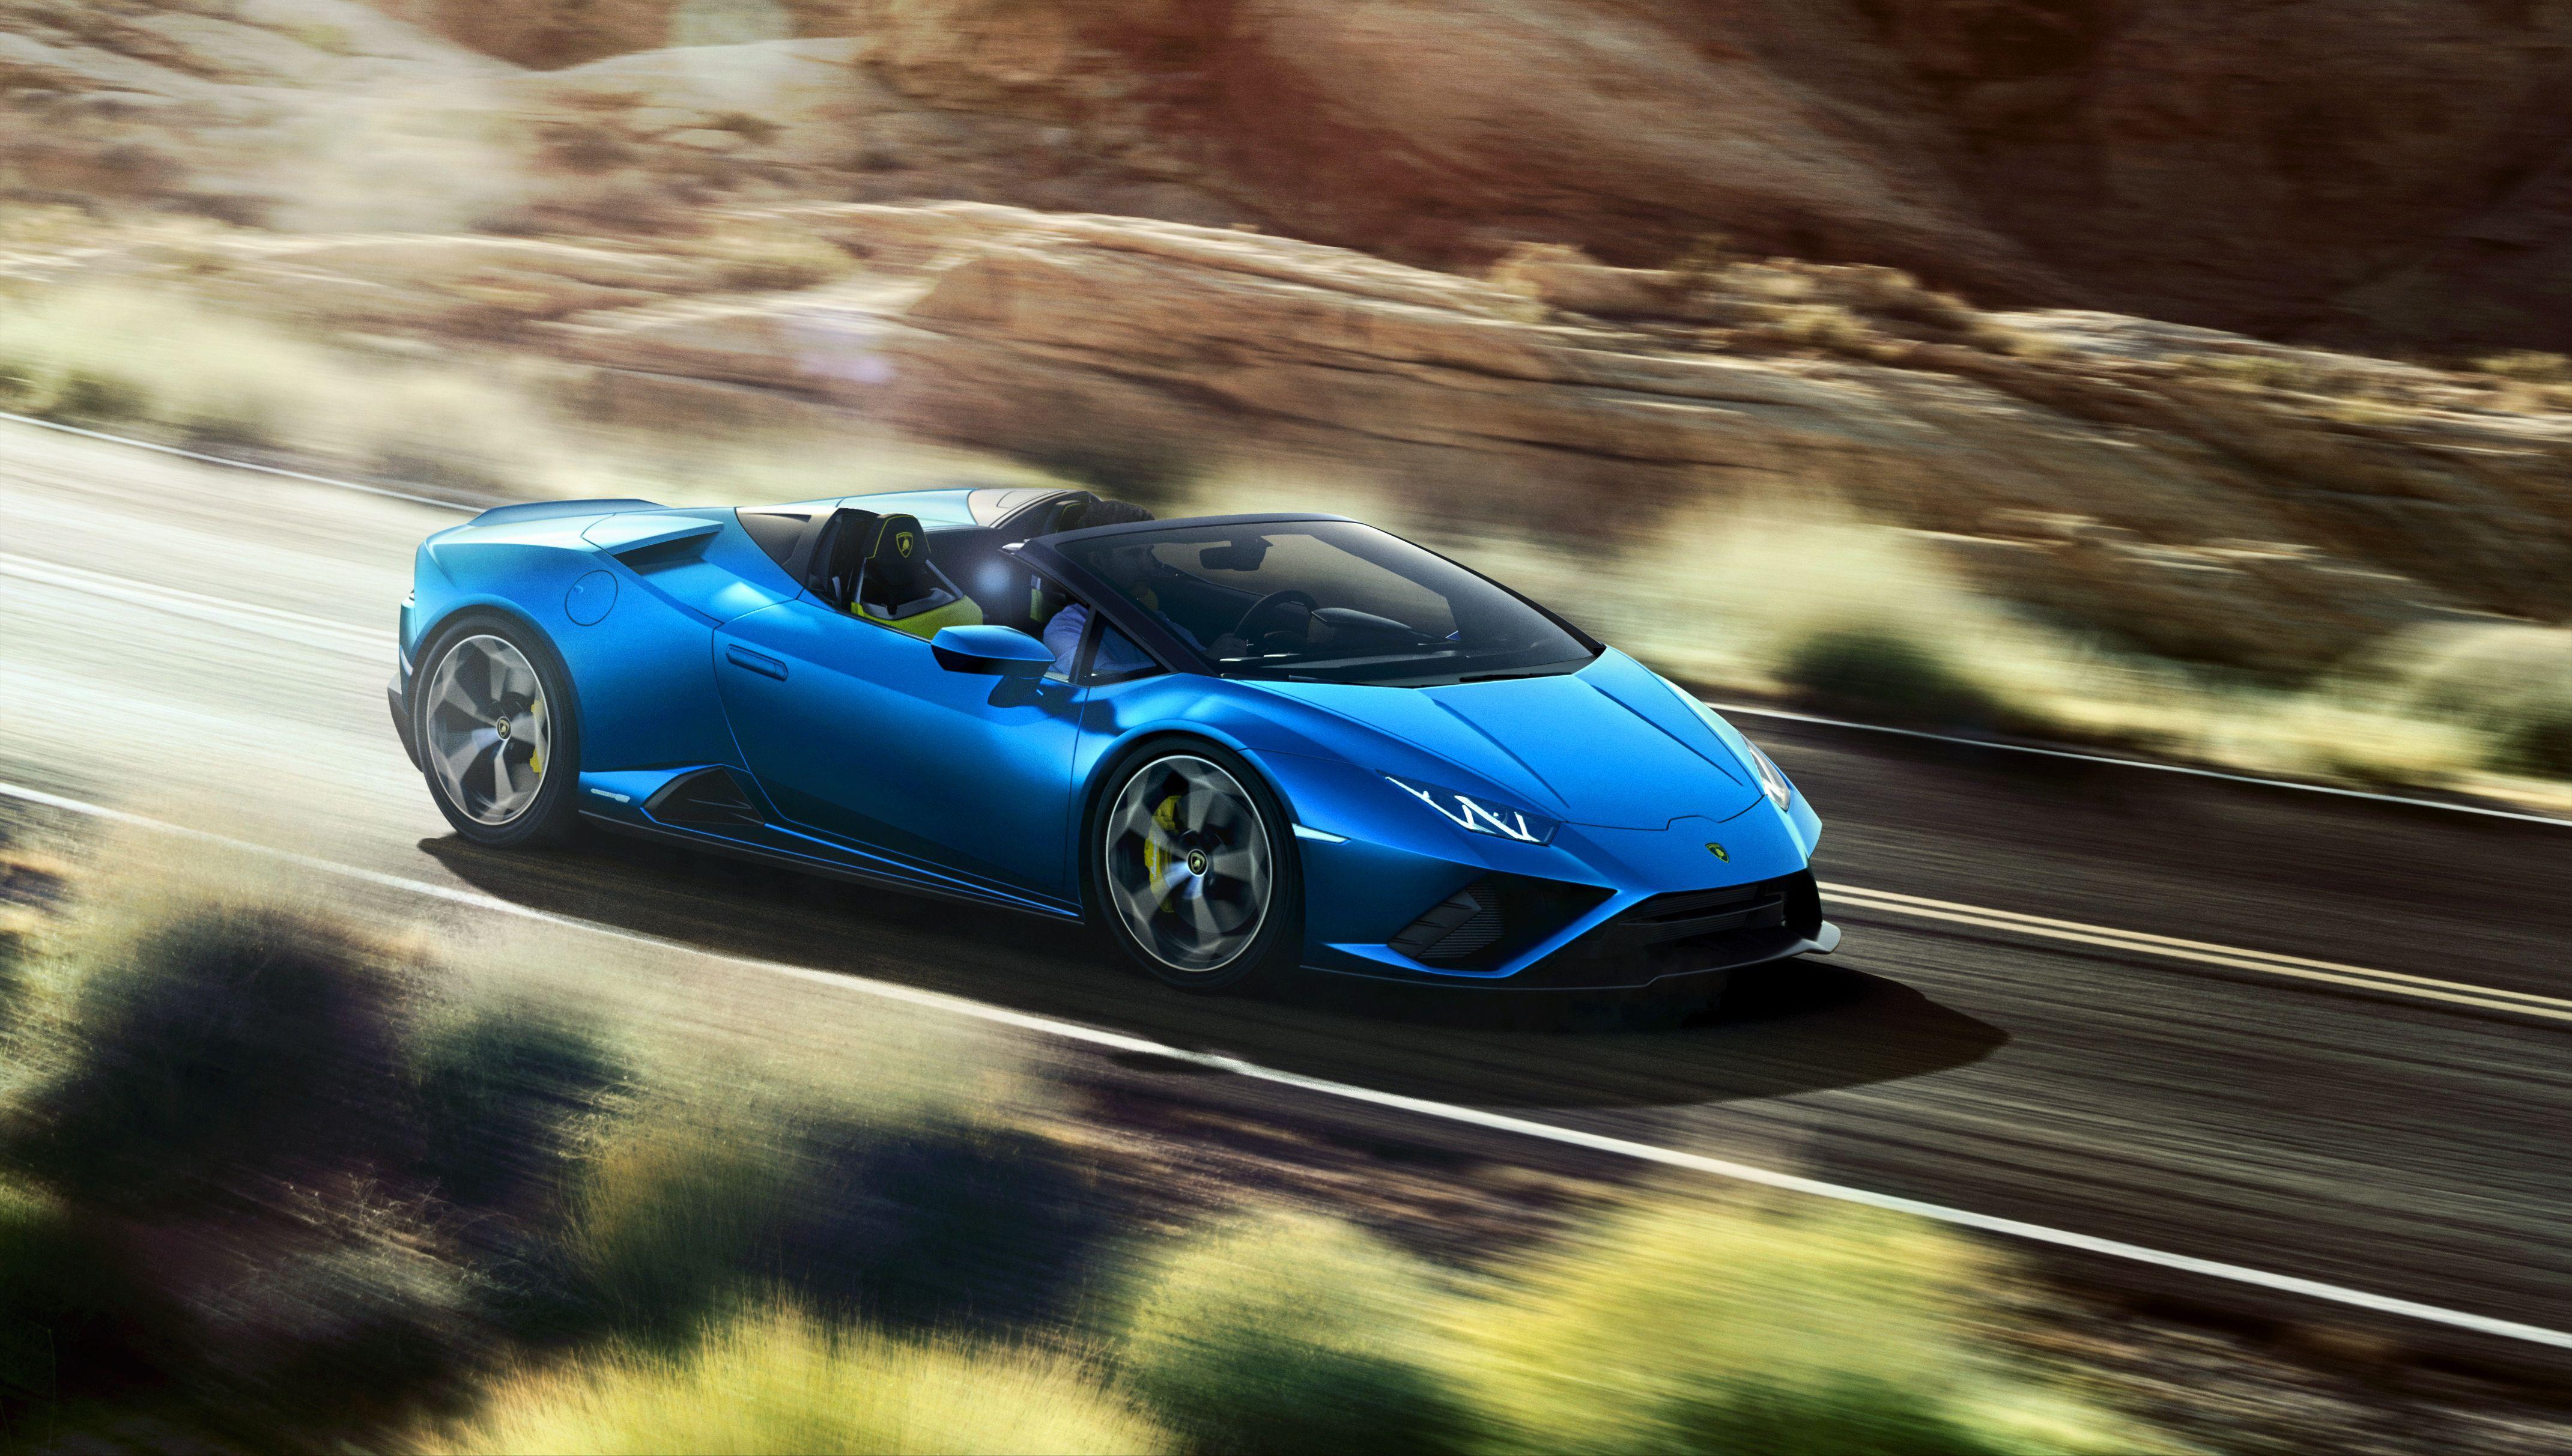 Lamborghini Huracan Evo Rwd Spyder Hits The Market With Unique Looks Top Speed In 2020 Lamborghini Huracan Rear Wheel Drive Lamborghini